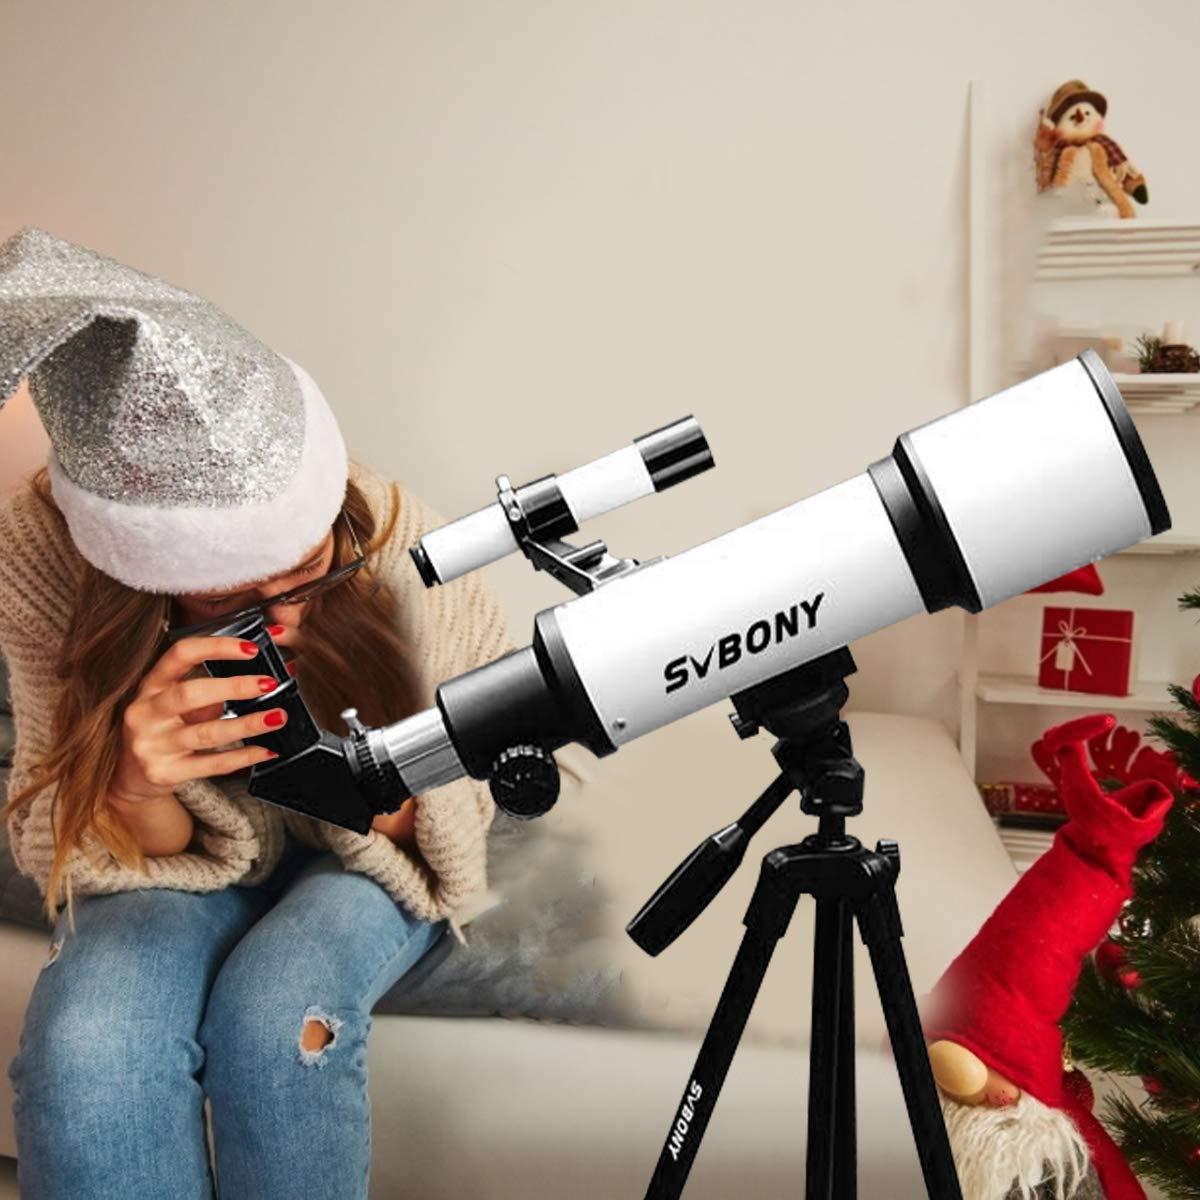 70mm Svbony SV501Telescopio Adultos Principiantes 70//420 Telescopio Astronomico Profesional Adultos Principiantes con Ajustable Tr/ípode Telescopio para Principiantes Adultos